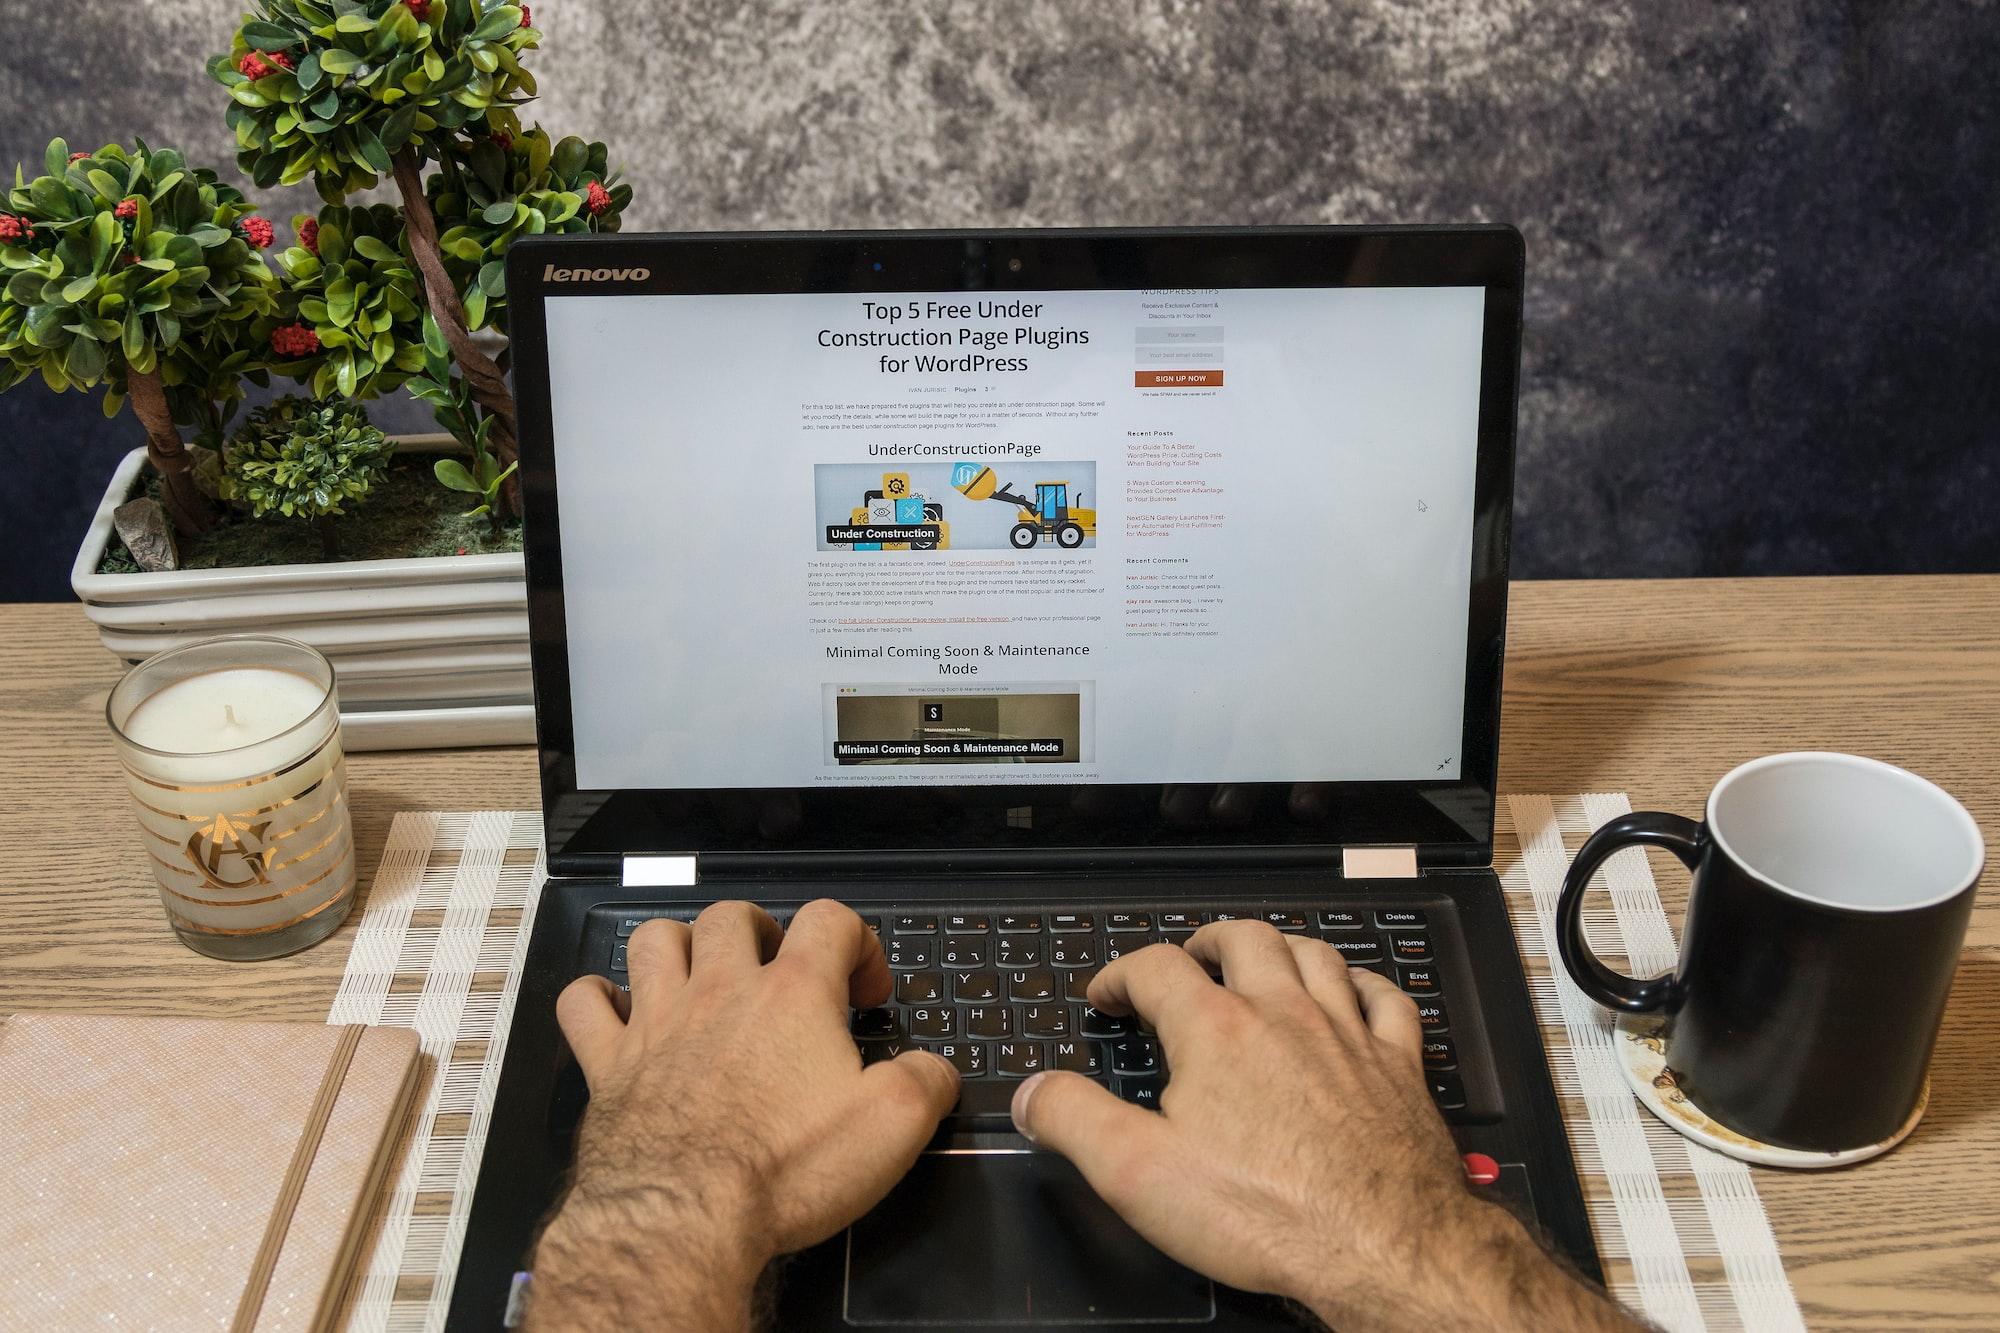 Browsing WordPress under construction plugins